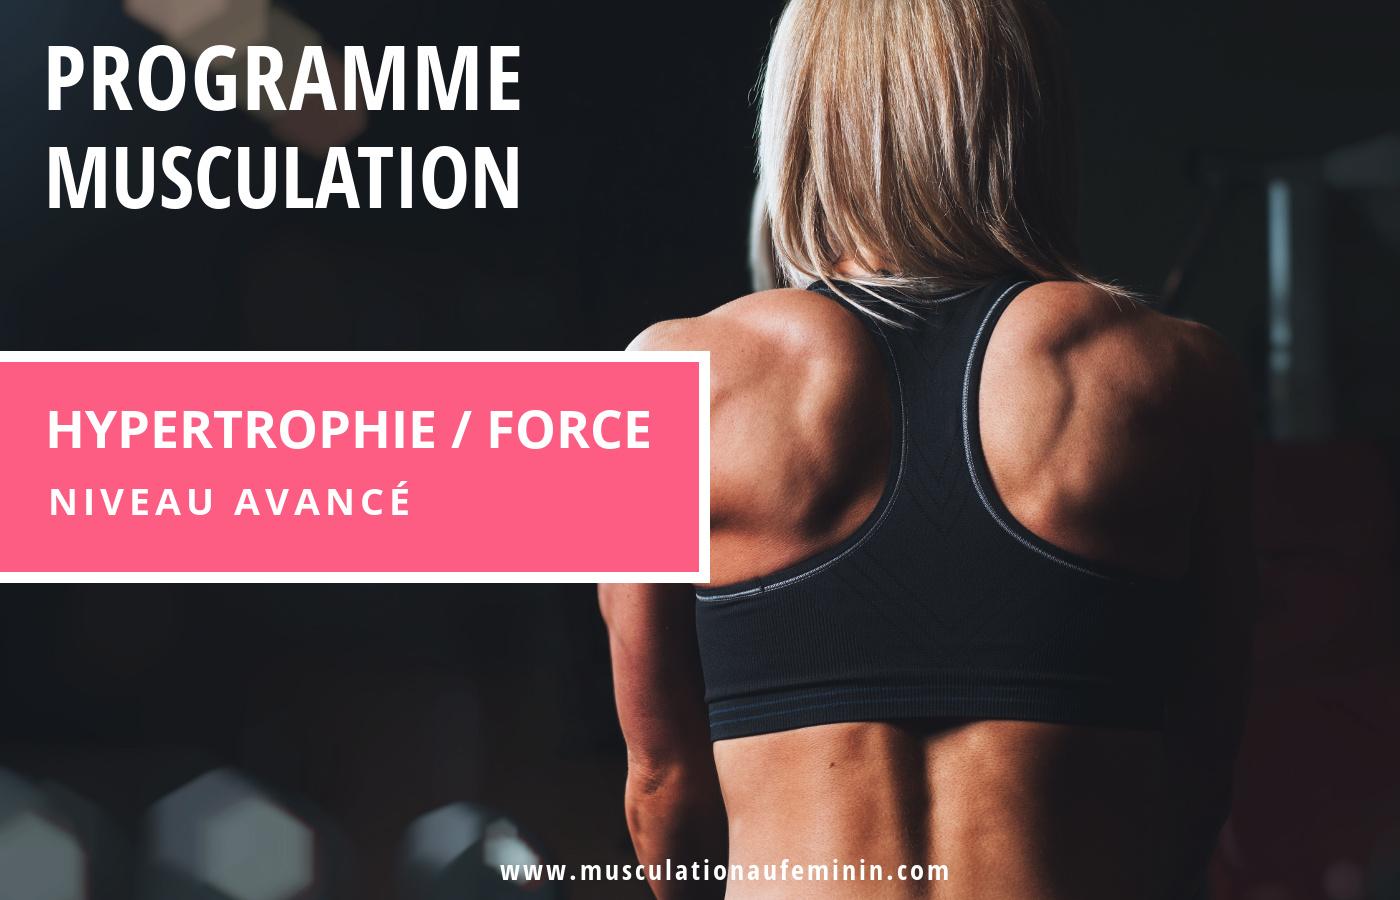 programme-musculation-femme-niveau-avance-force-hypertrophie